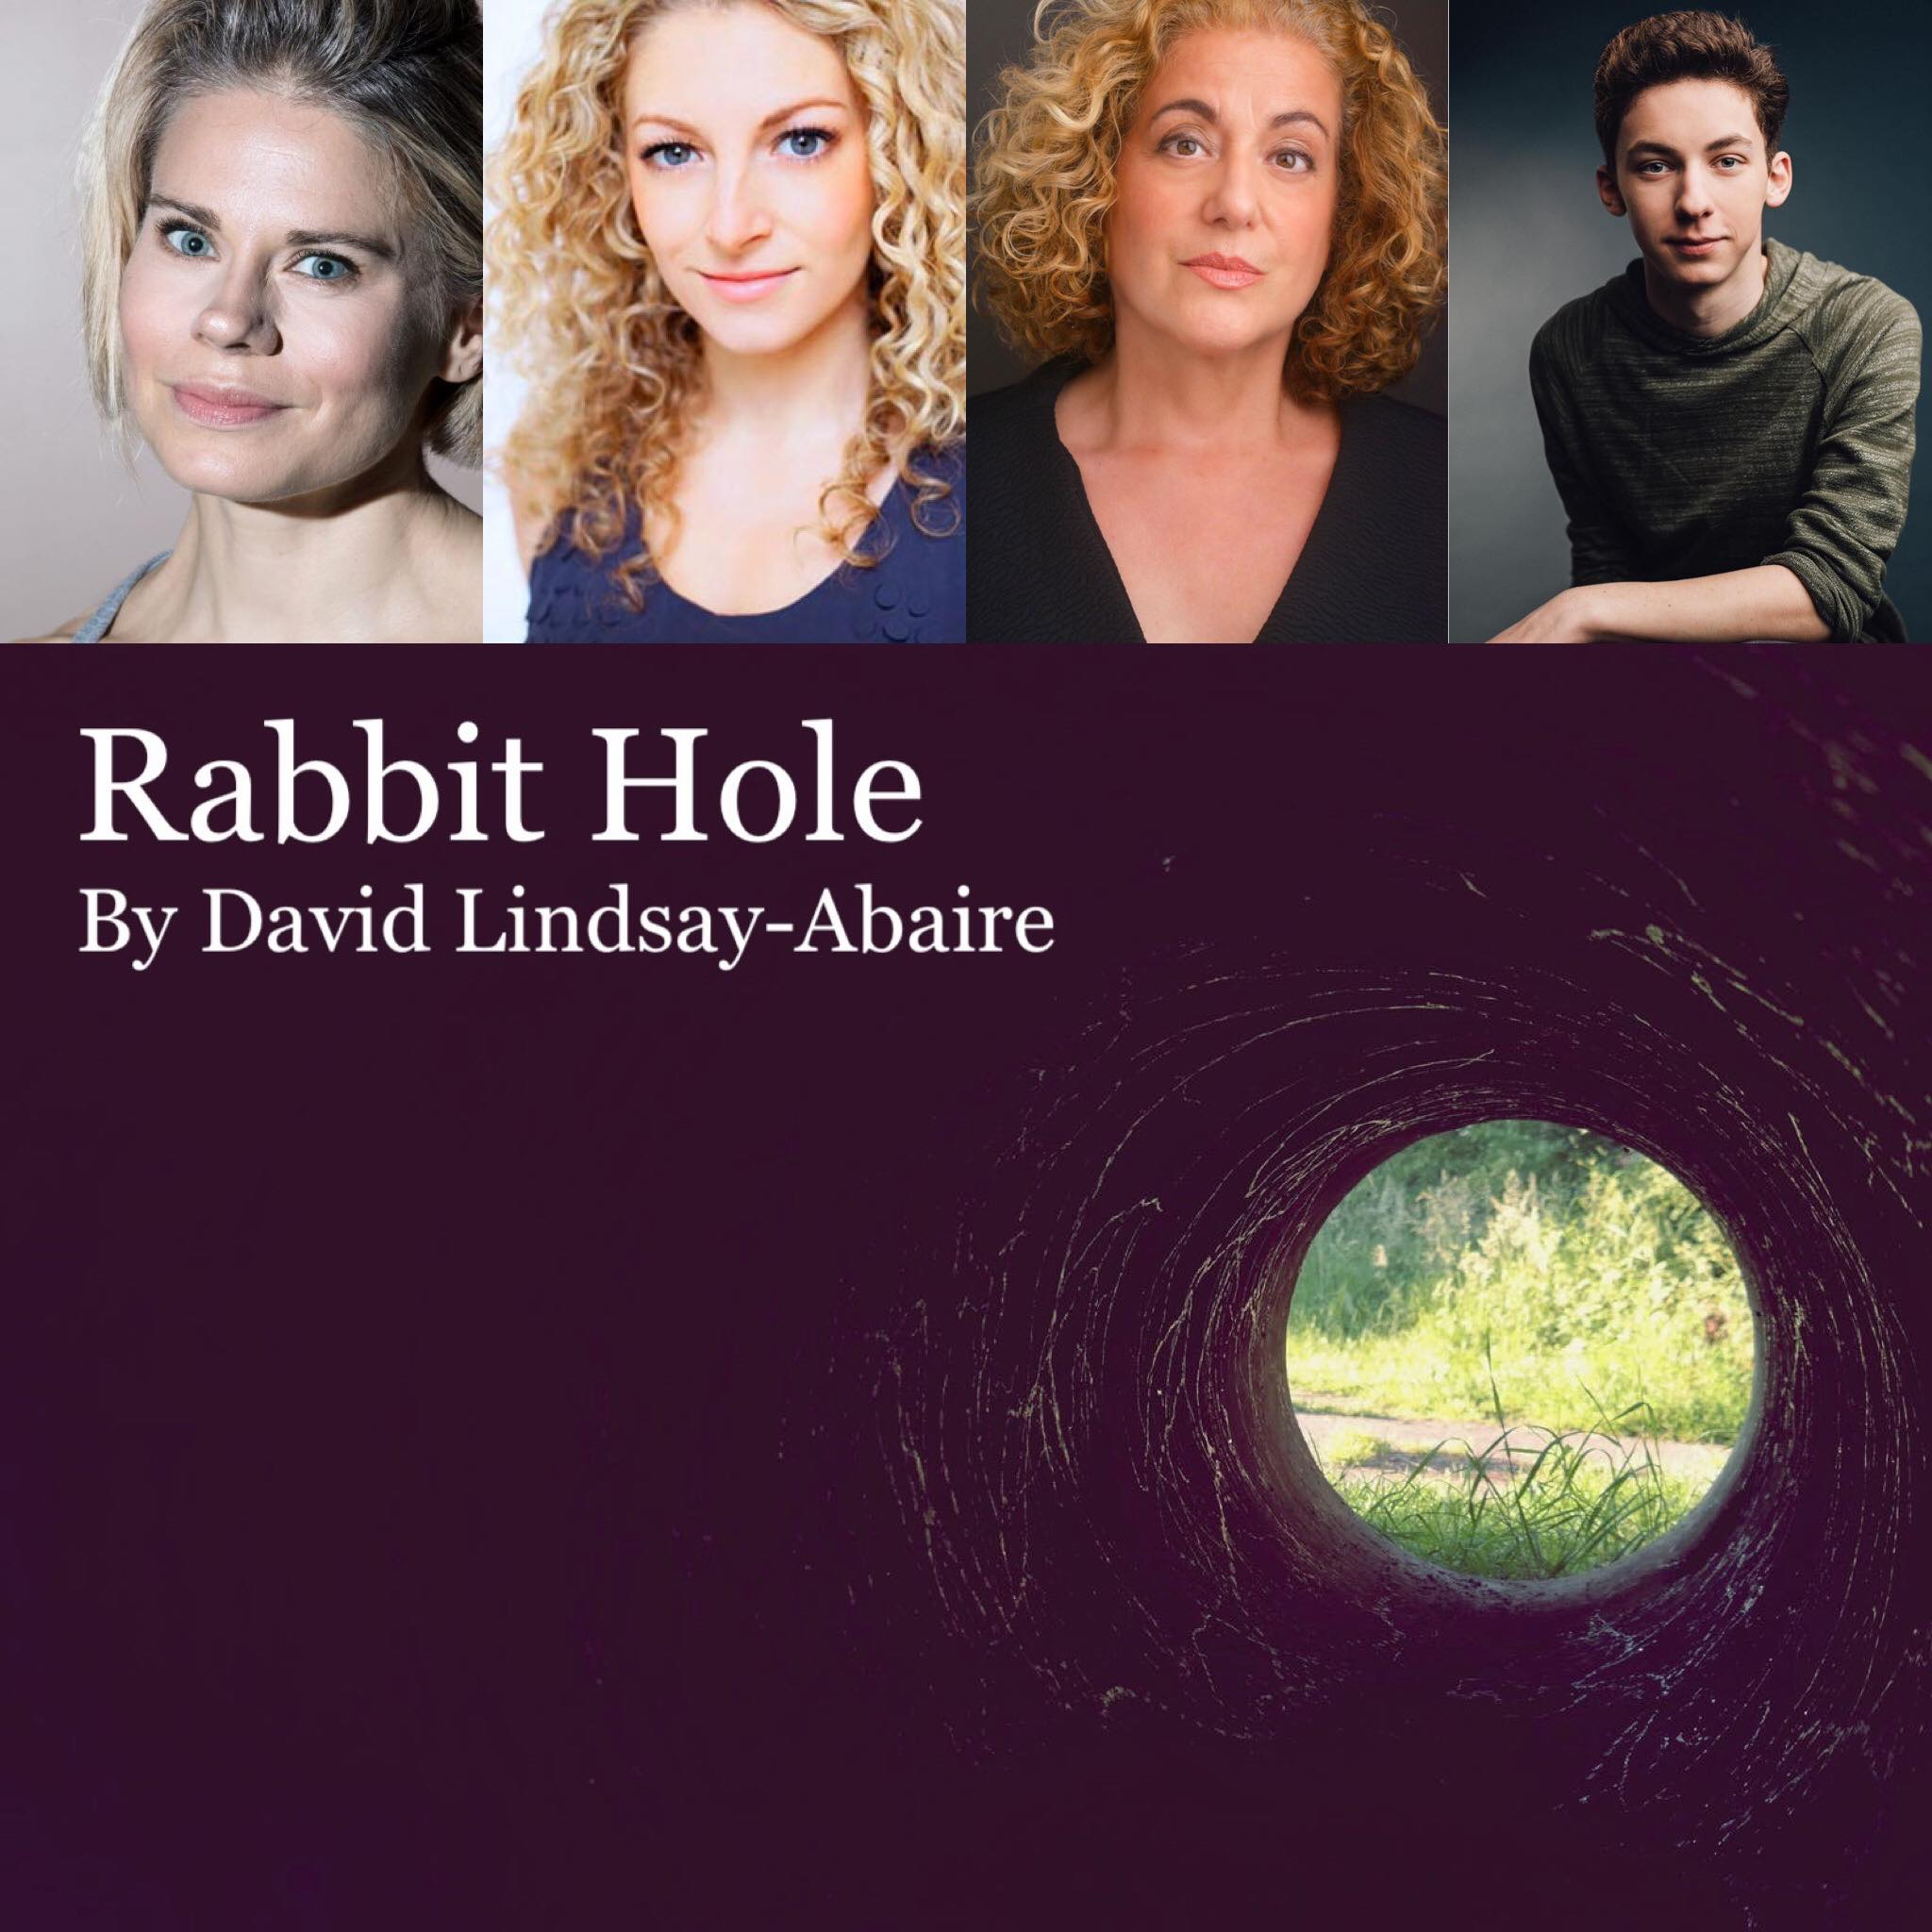 Celia Keenan-Bolger, Lauren Molina, Mary Testa, and Andrew Barth Feldman Set For The Reading Series' RABBIT HOLE